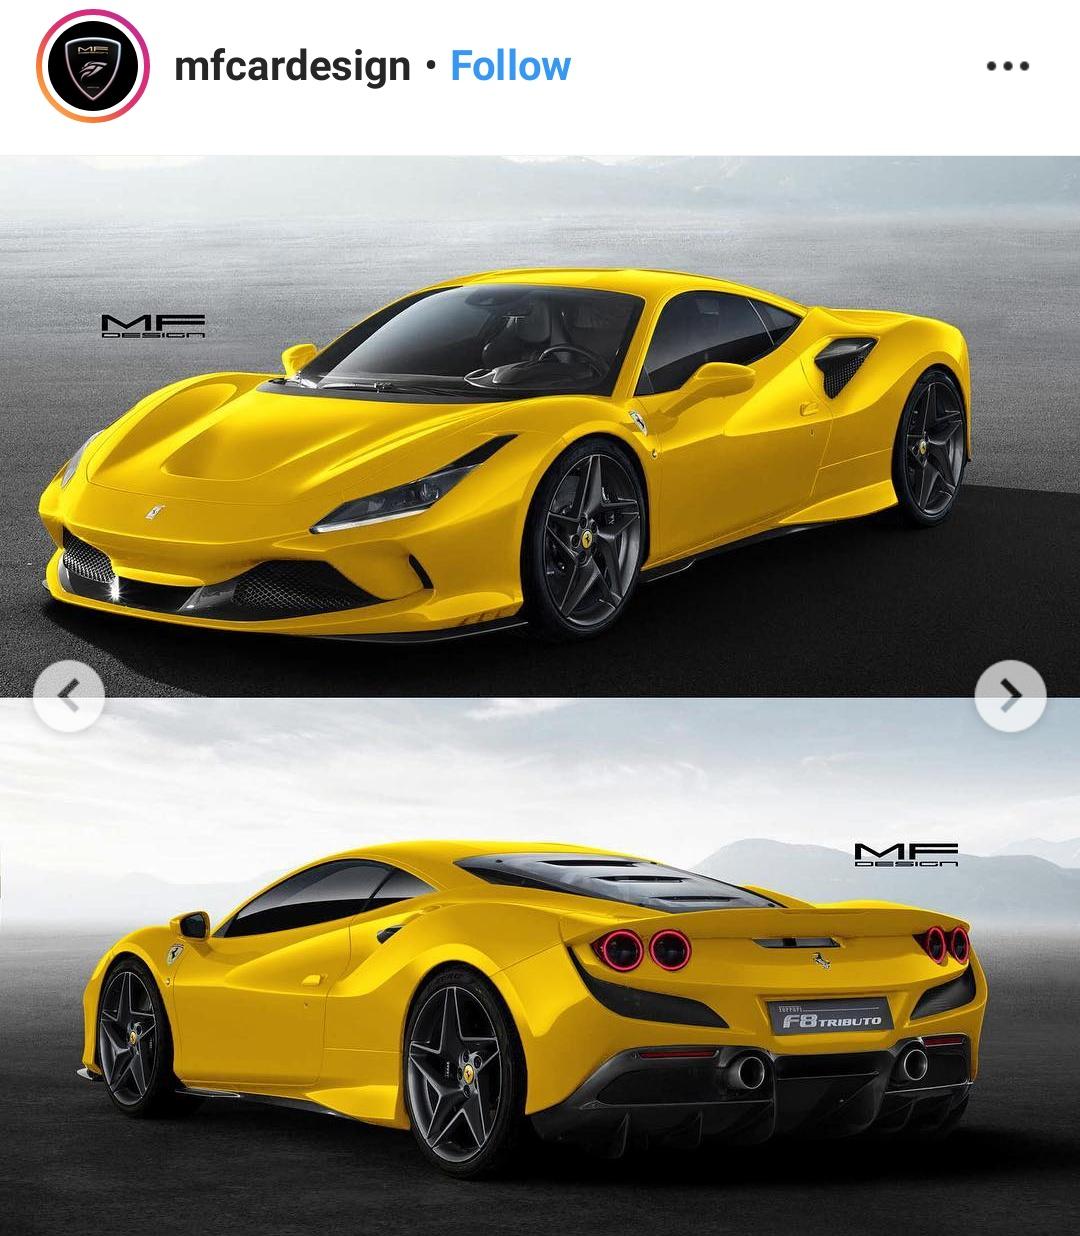 Ferrari 488 Tributo: [情報] 新Ferrari F8 Tributo 720匹 2.9秒 (488)